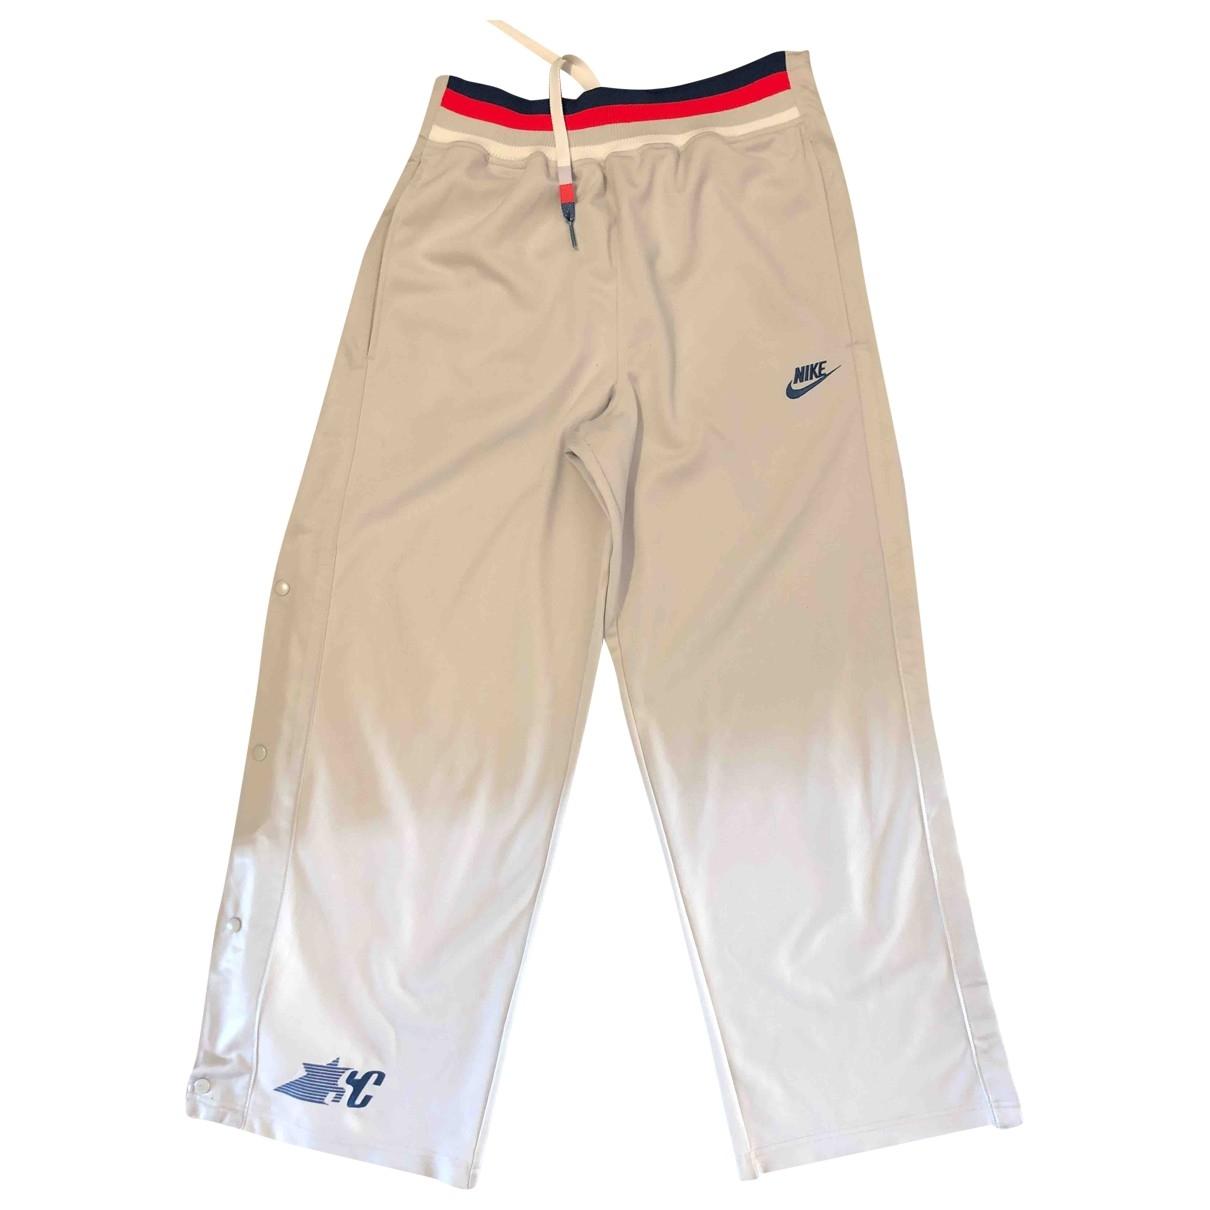 Nike \N Grey Trousers for Women M International